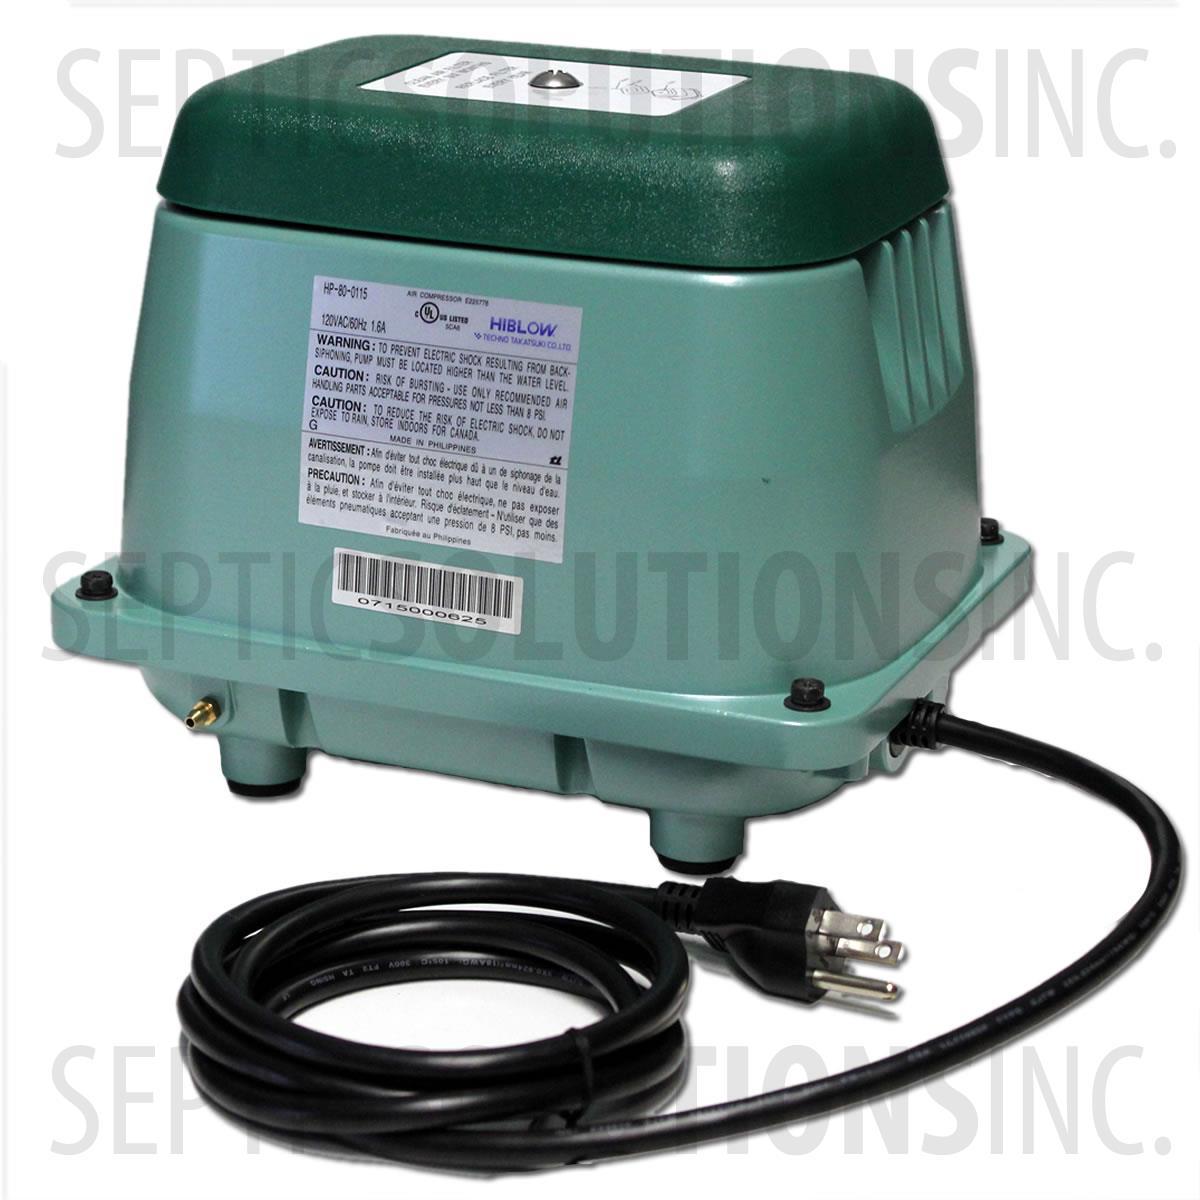 H500_2?w=300 hoot troy air aerobic system air pumps and repair parts  at alyssarenee.co